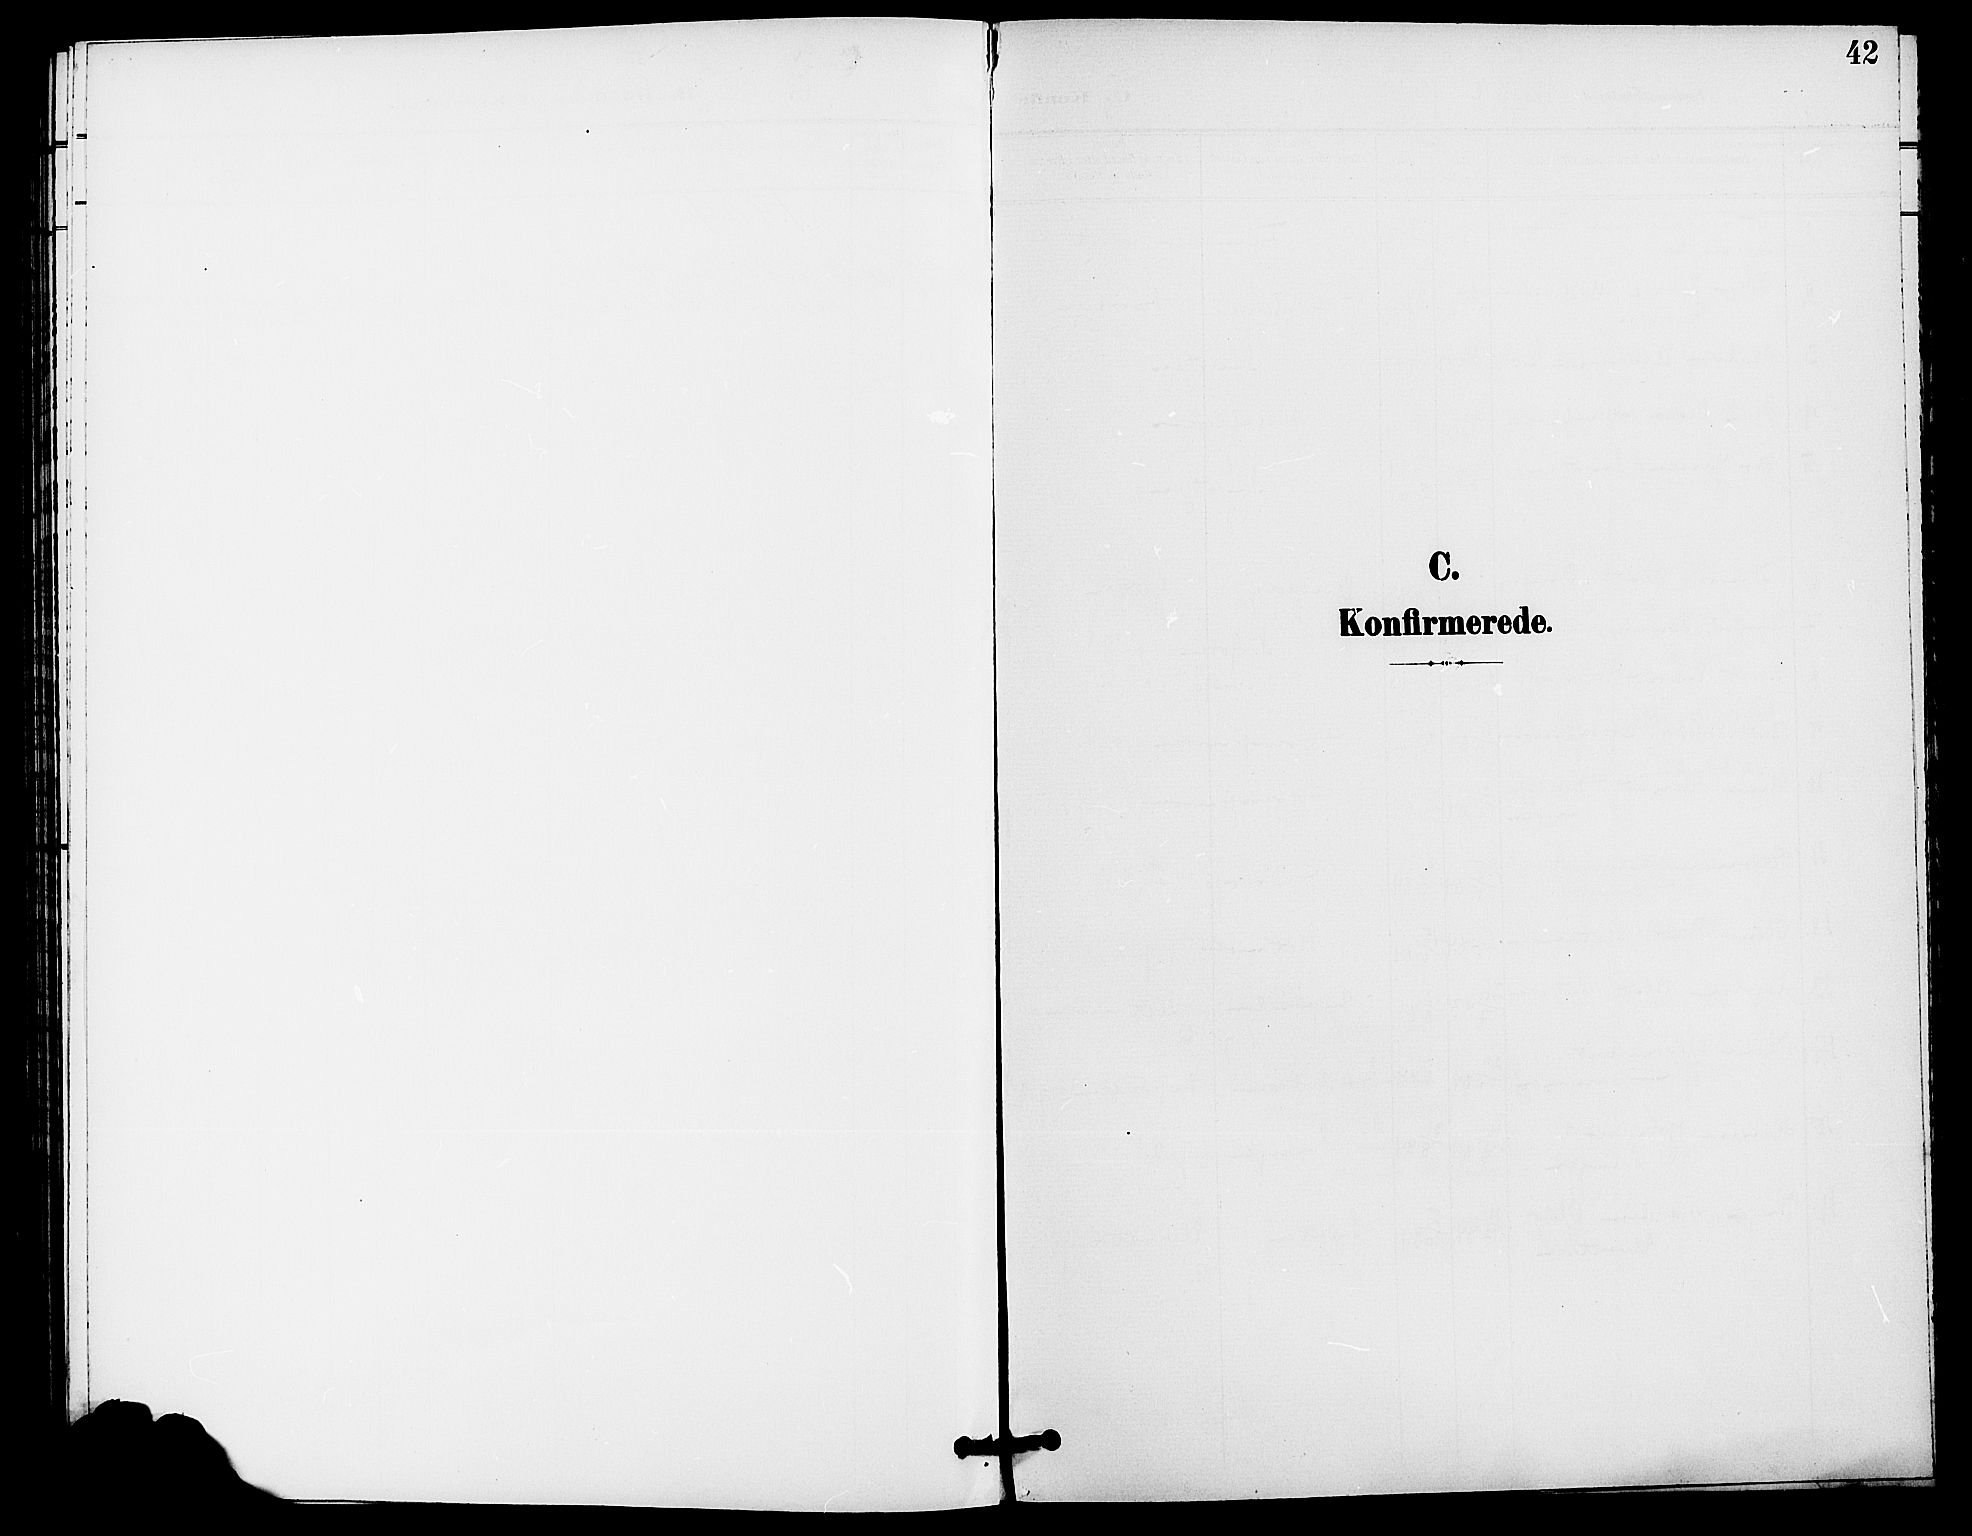 SAH, Rendalen prestekontor, H/Ha/Haa/L0008: Ministerialbok nr. 8, 1898-1910, s. 42